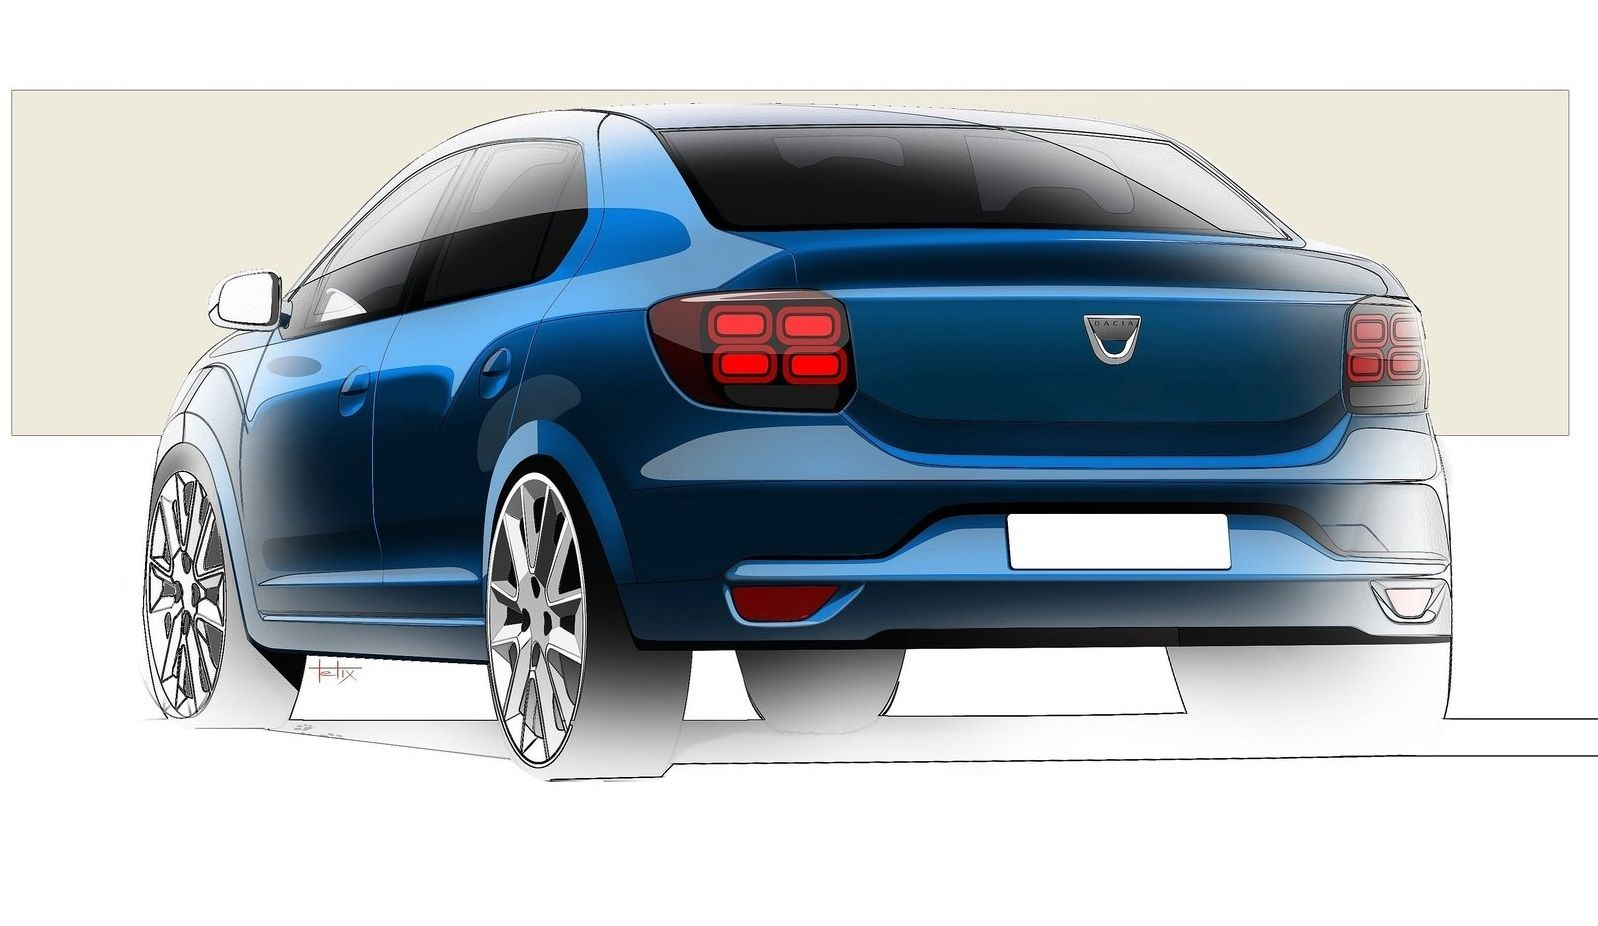 16+ Dacia urban city car ideas